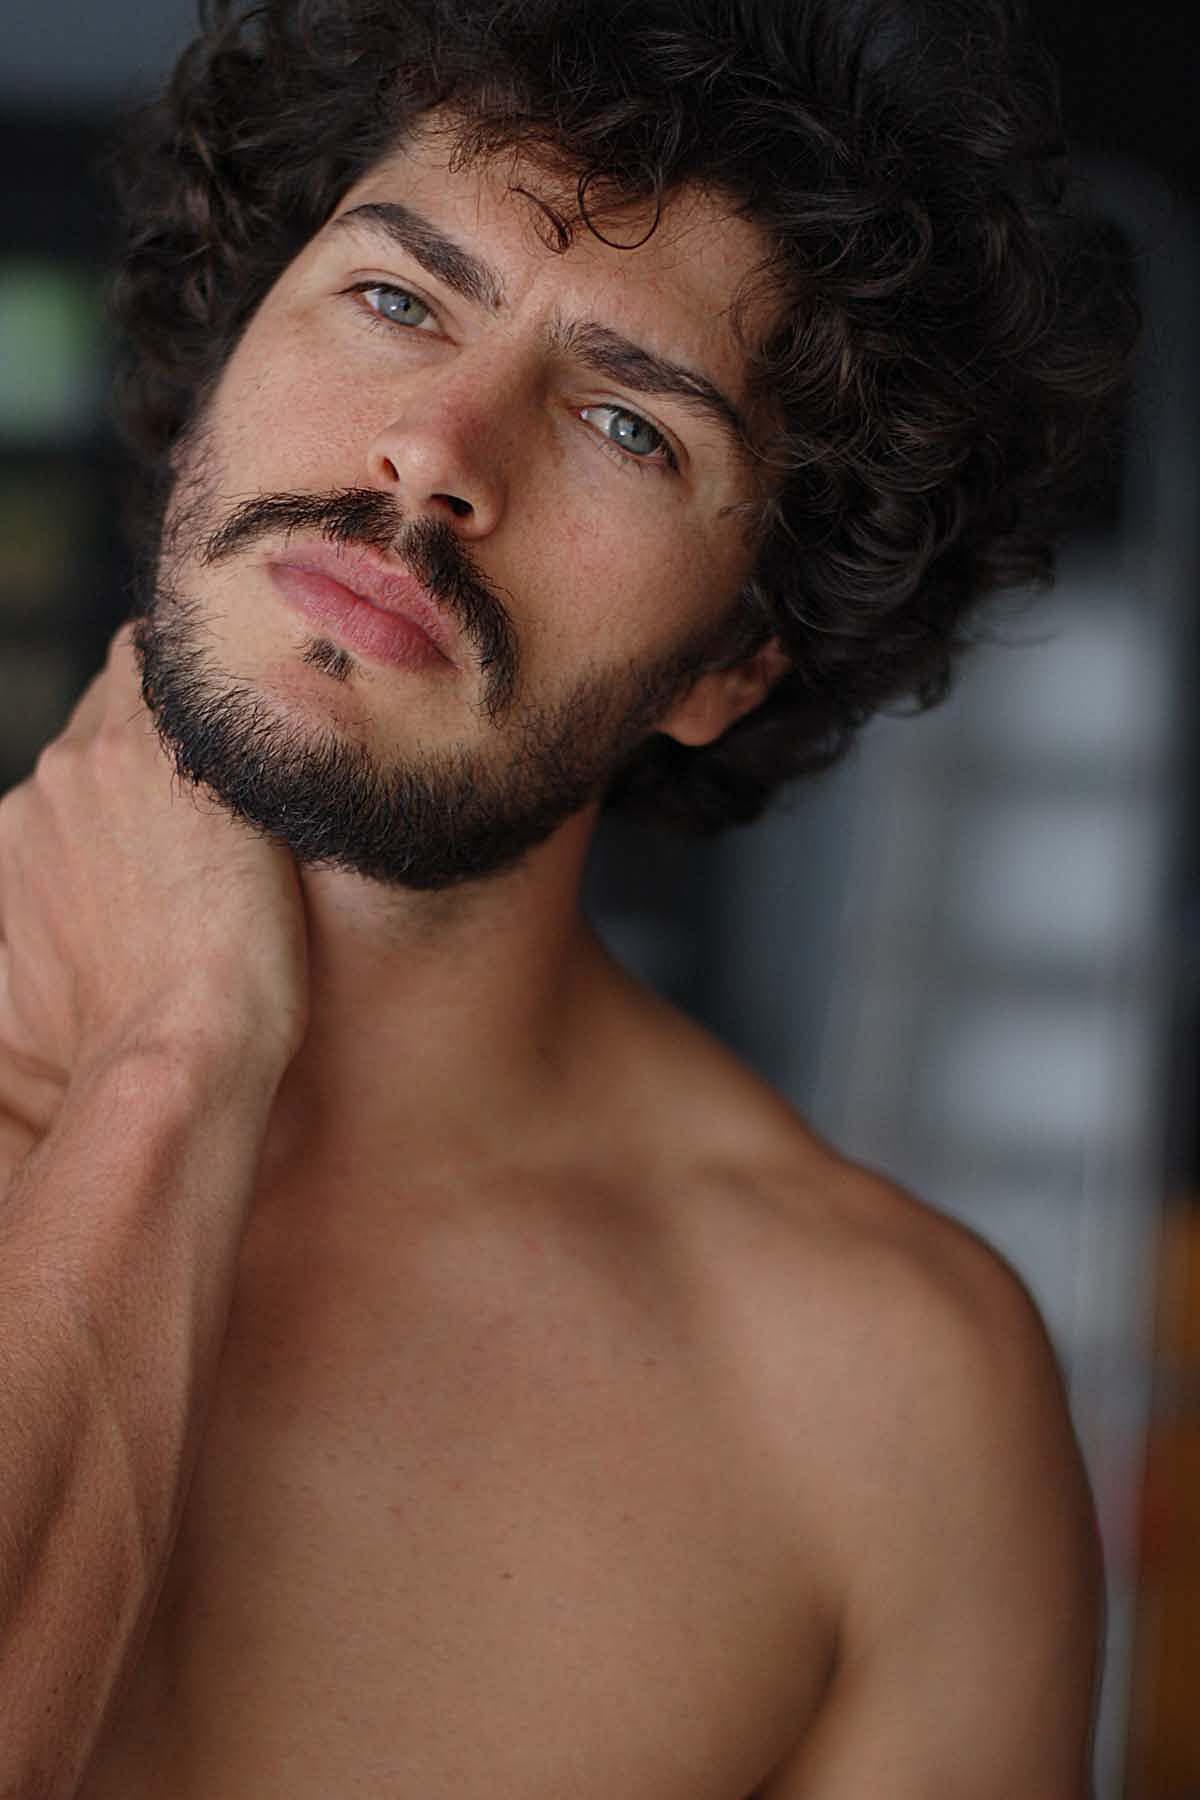 Dego Ferreira by Vinicius Zievinic for Brazilian Male Model